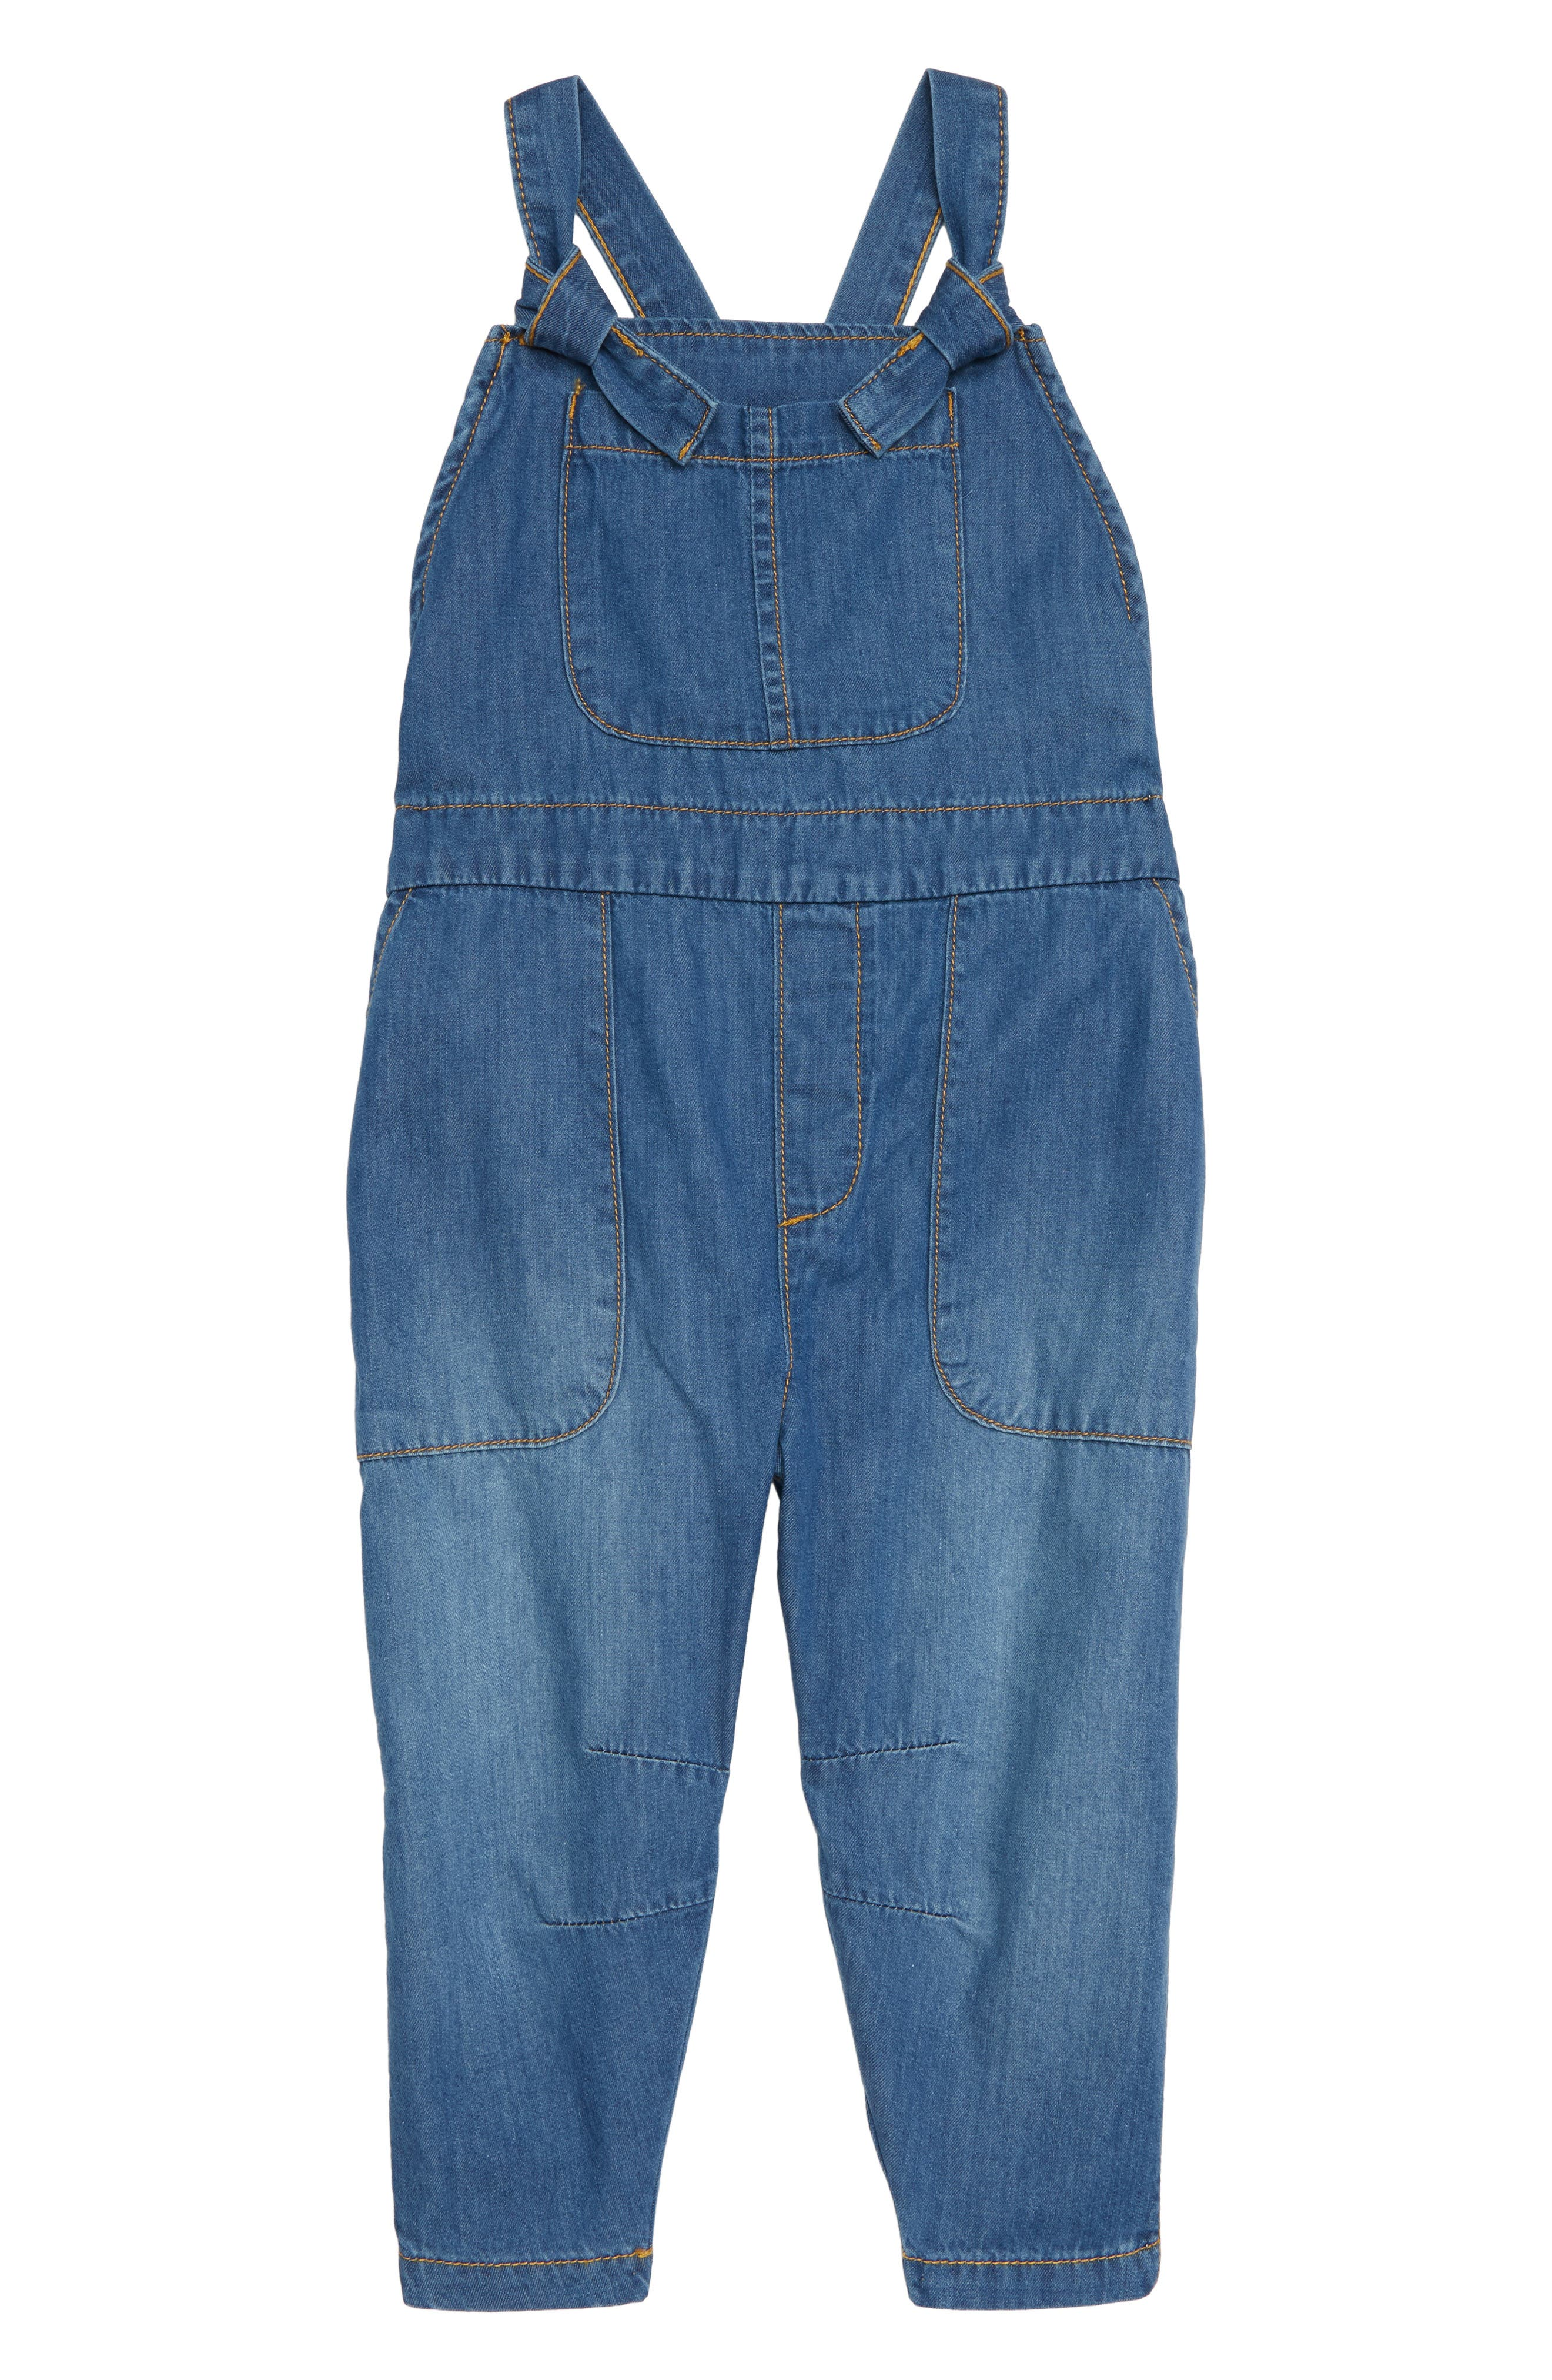 Denim Overalls,                         Main,                         color, BLUE BOW WASH